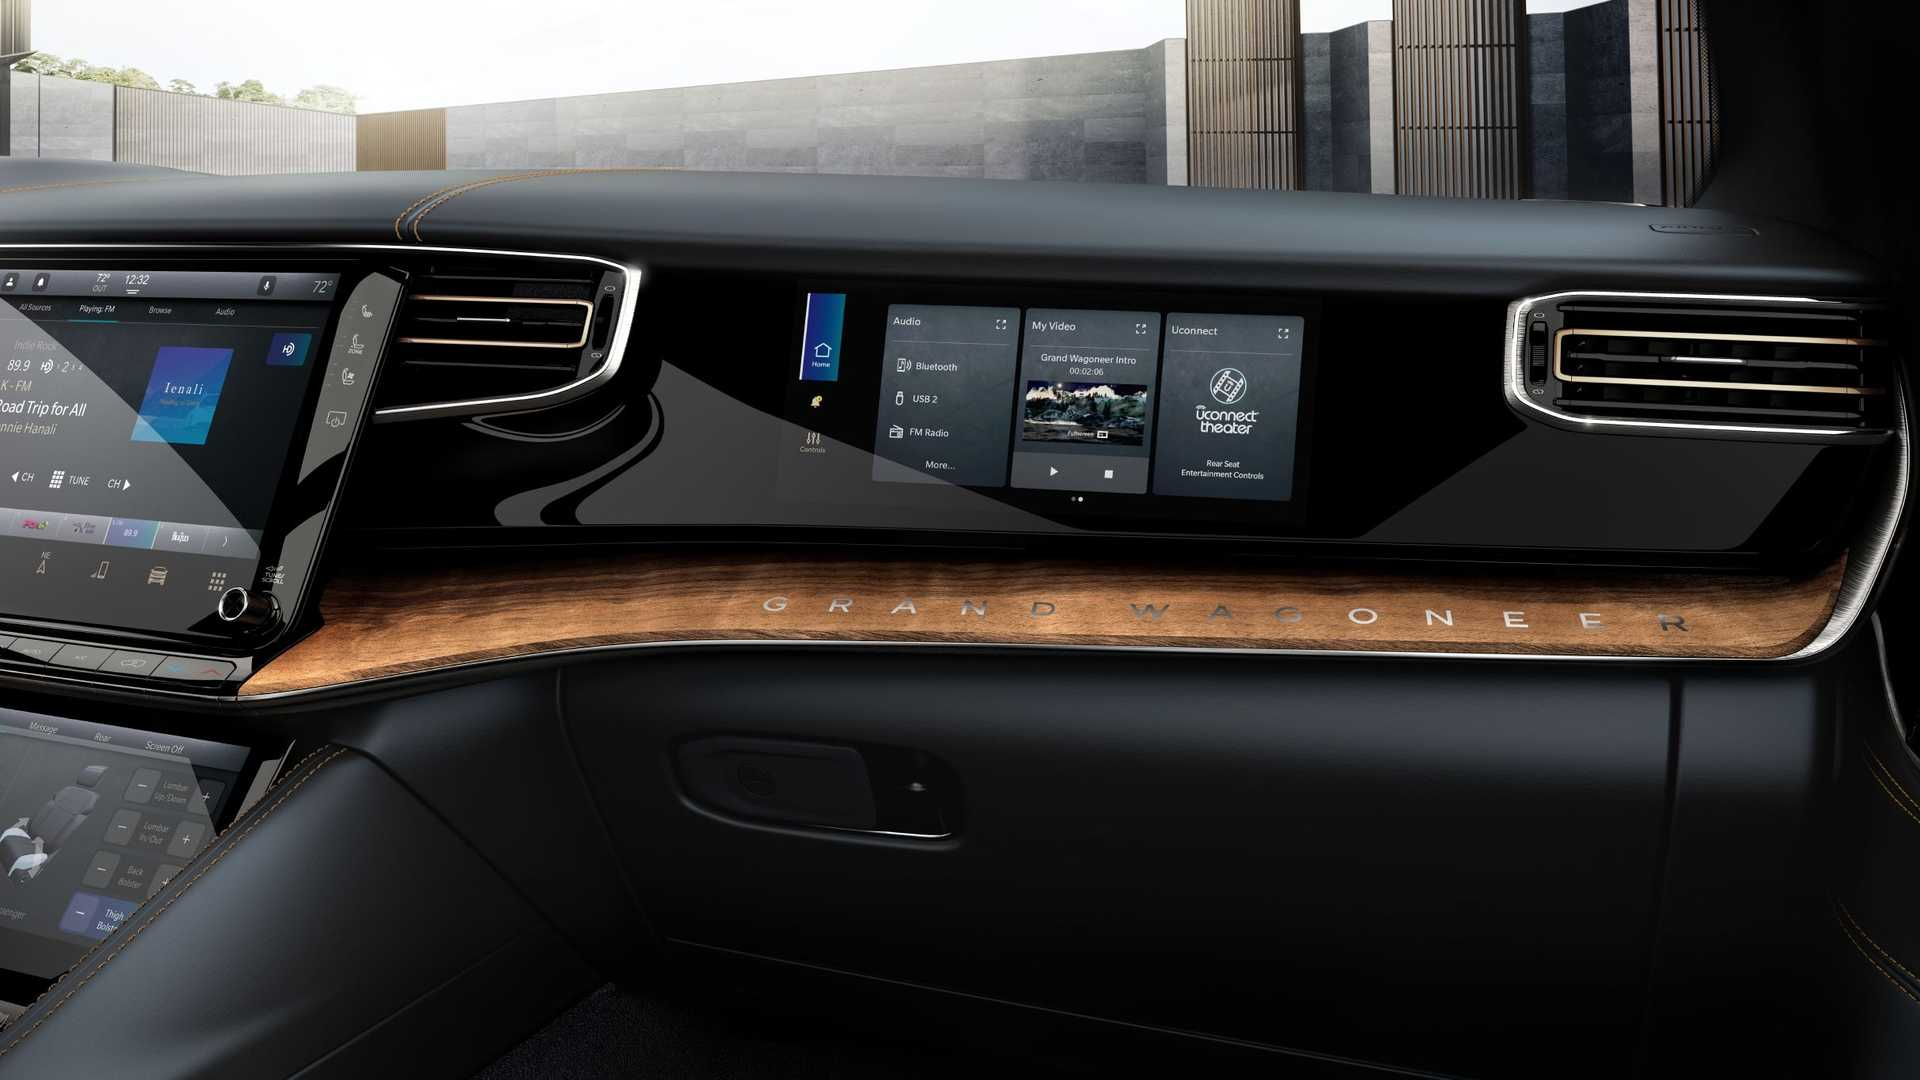 2022-jeep-grand-wagoneer-interior-passenger-infotainment-screen-1